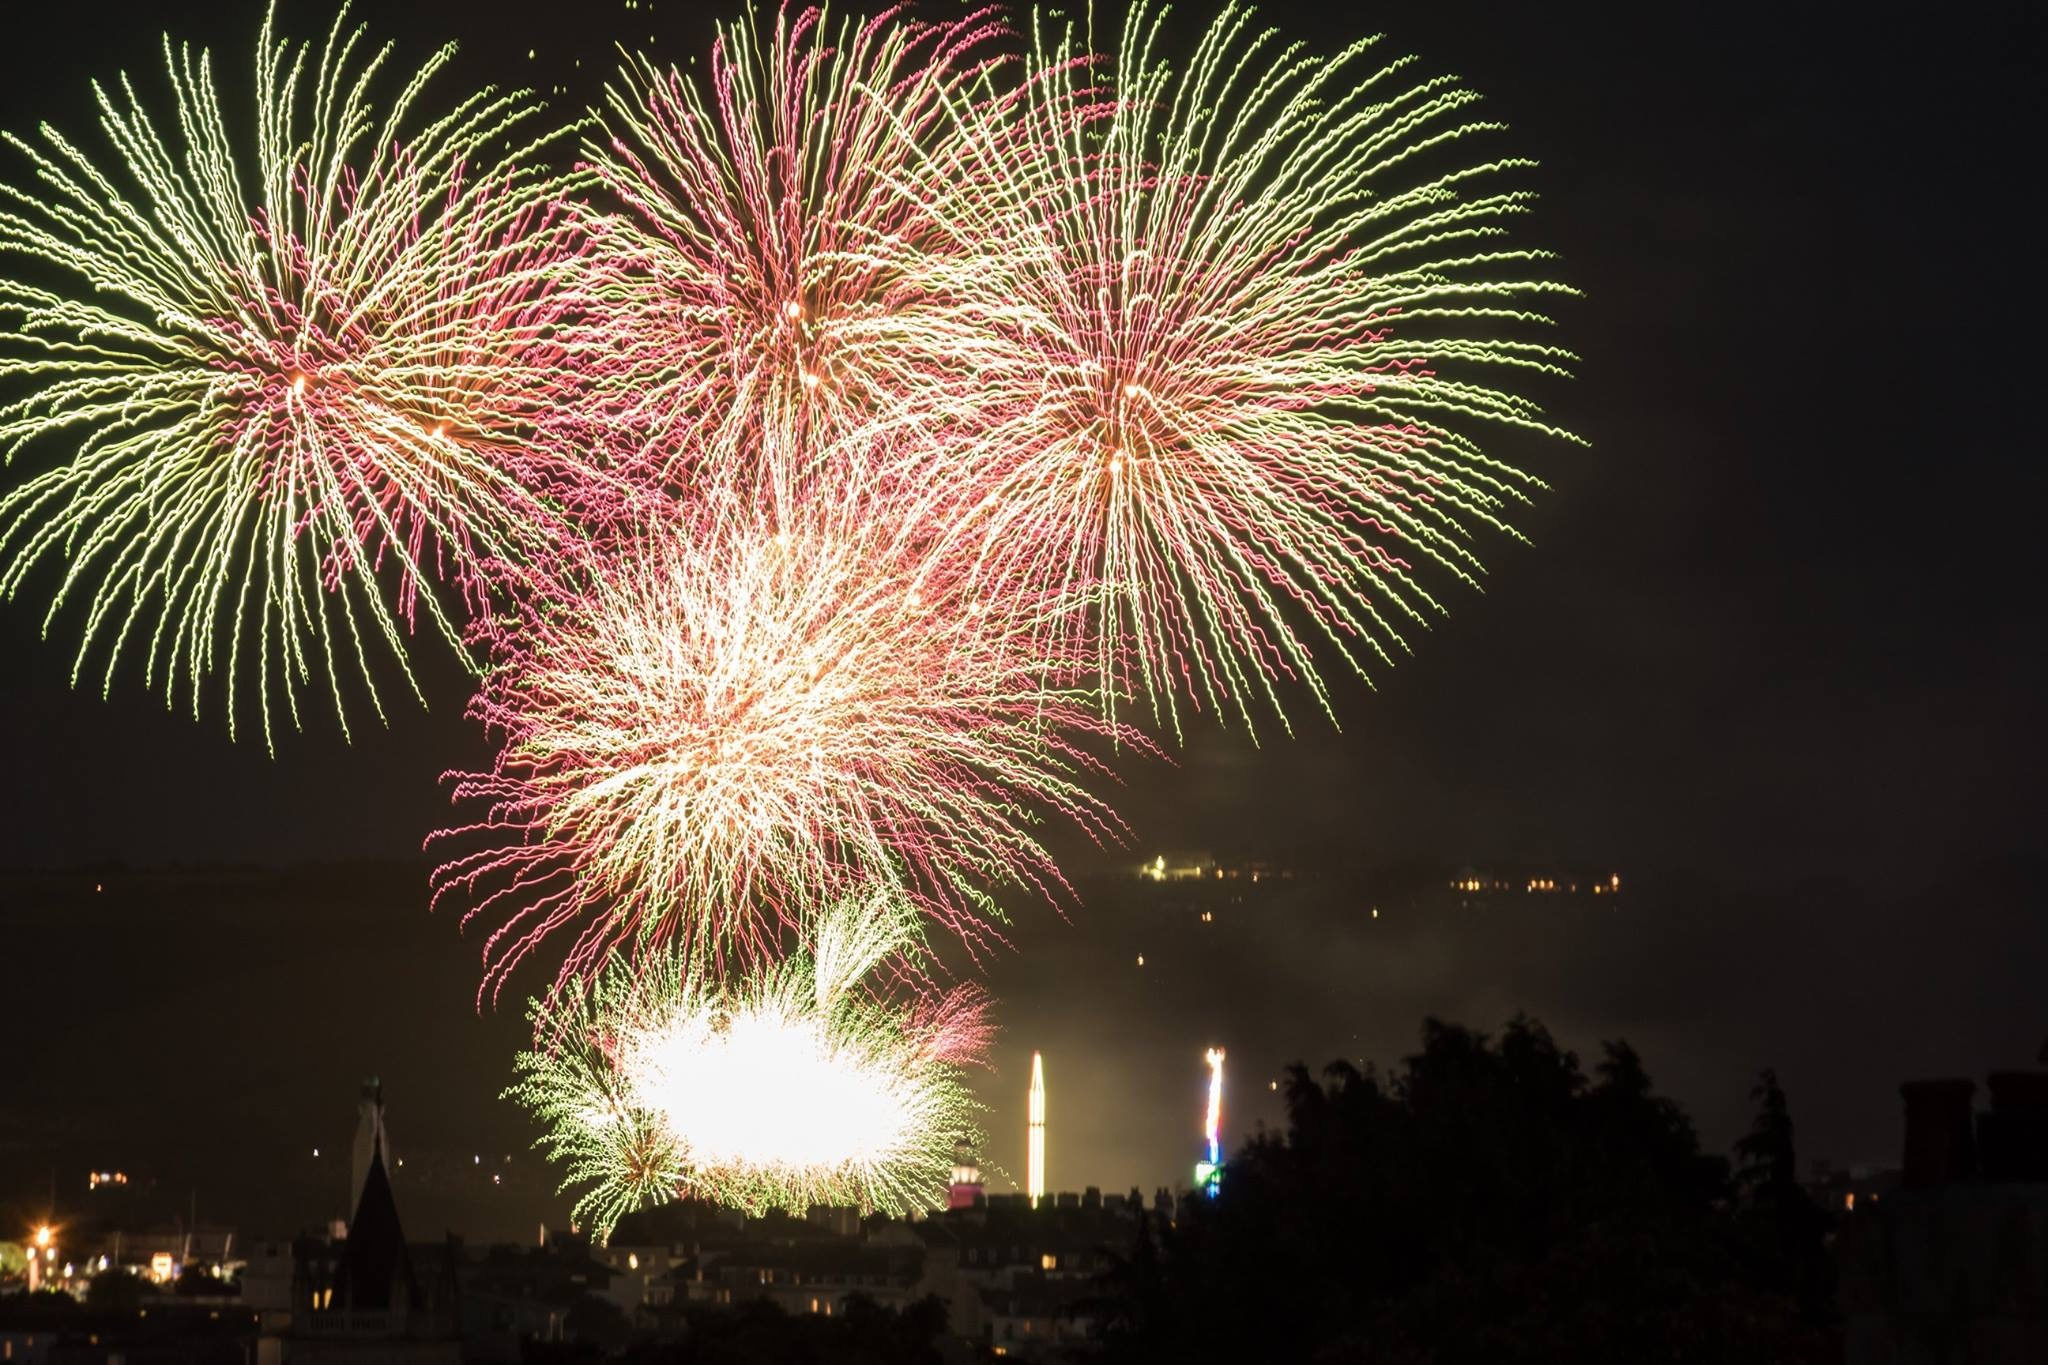 Fireworks by Phil Morgan